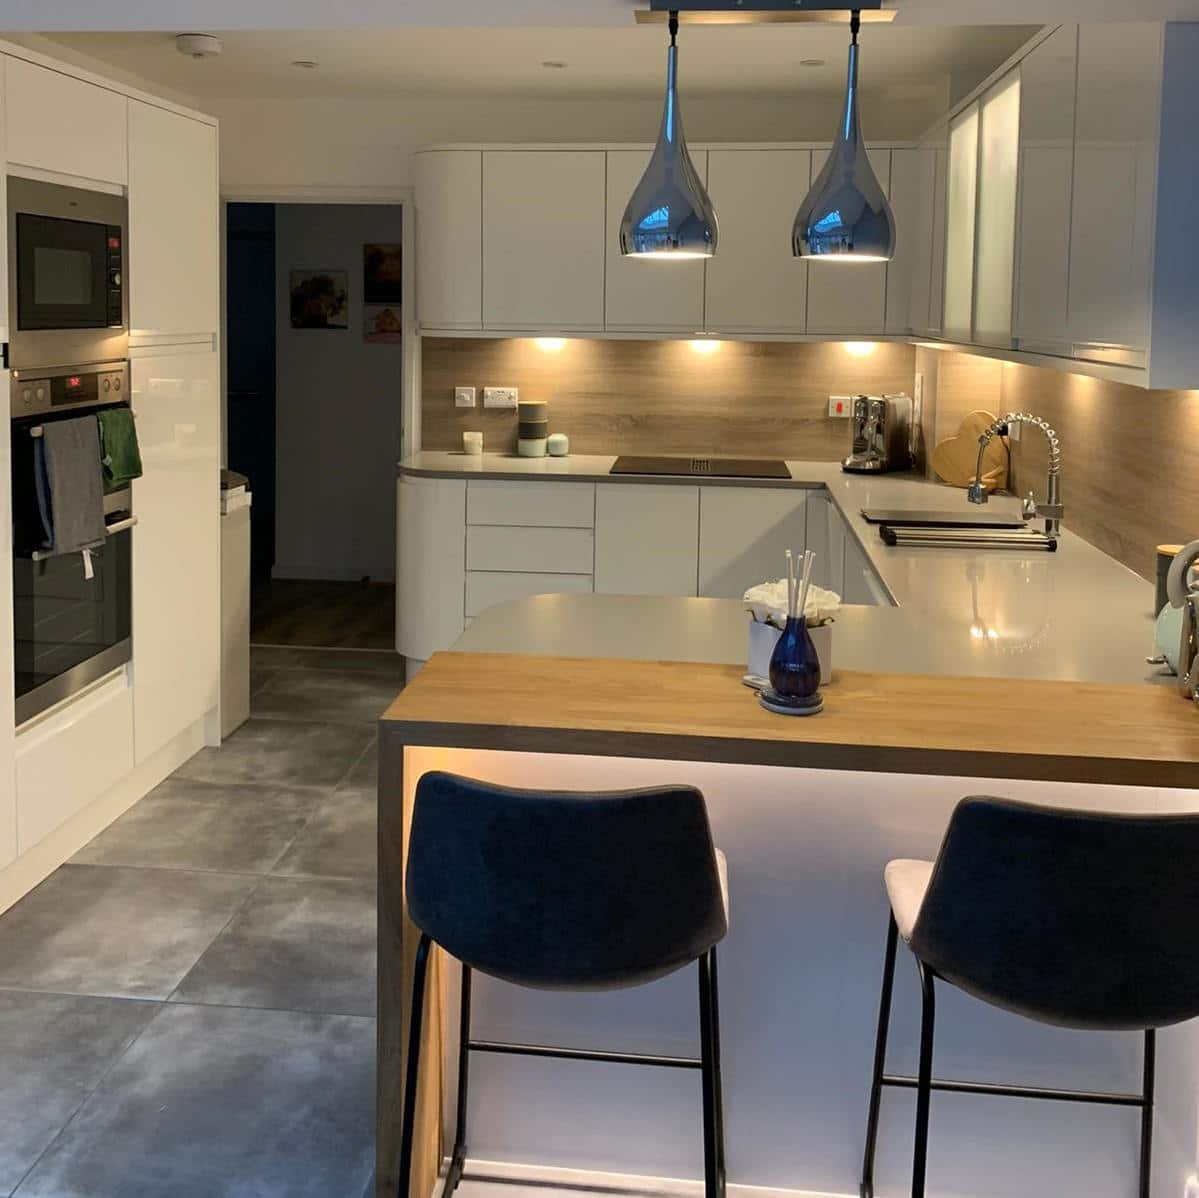 Contemporary Strada Gloss White kitchen with peninsula. Laminate splashback